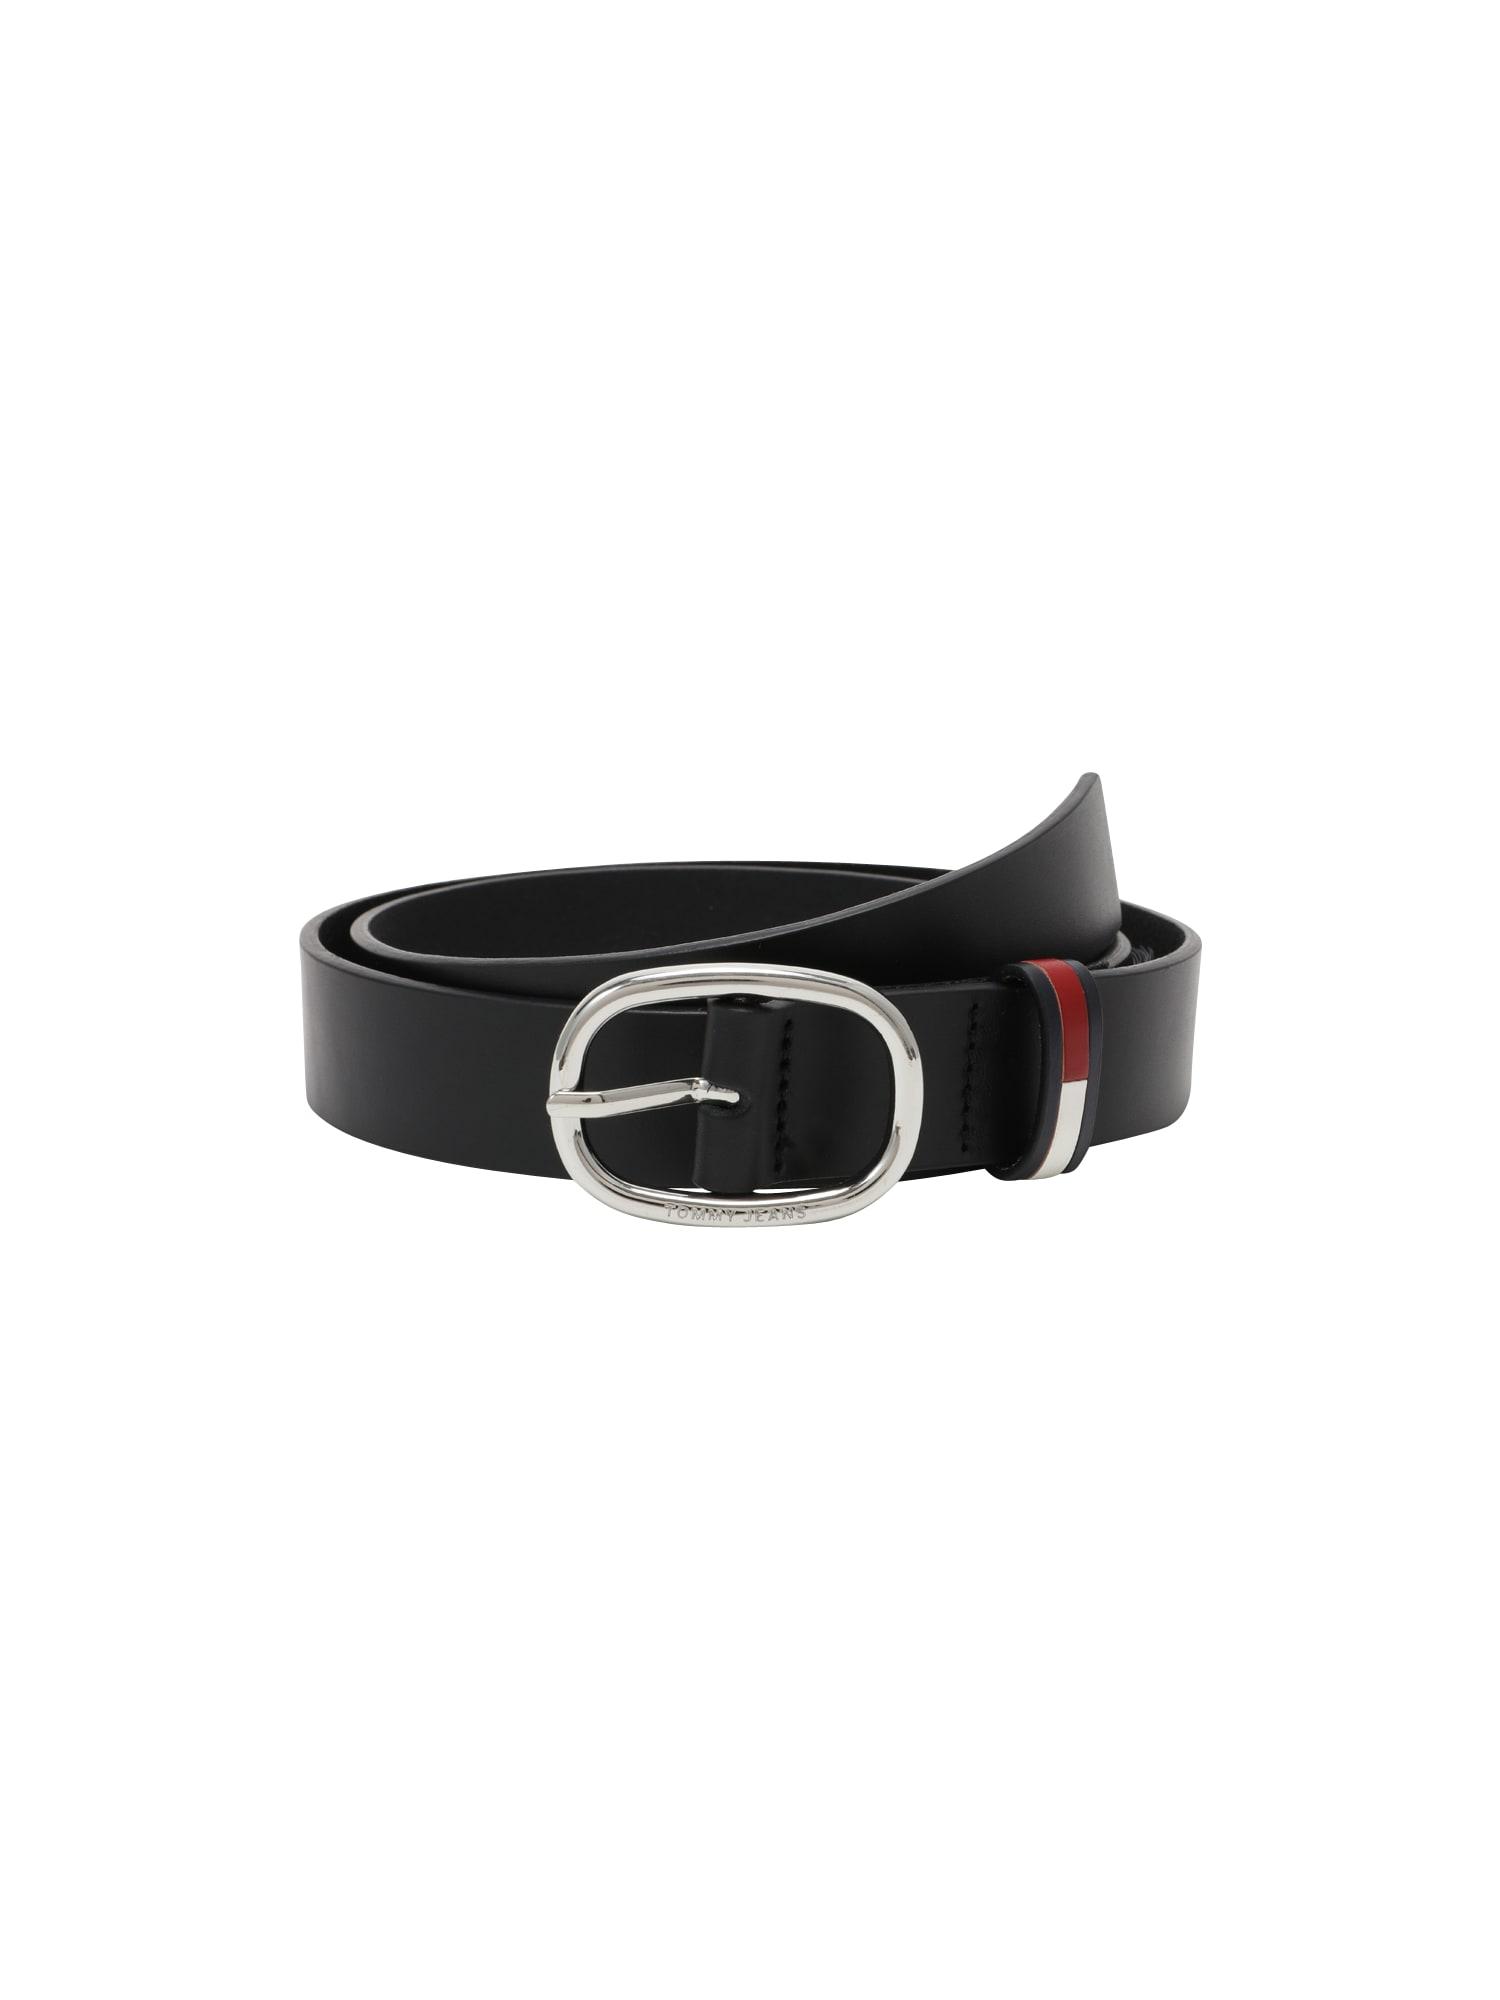 Tommy Jeans Diržas juoda / balta / tamsiai mėlyna / raudona